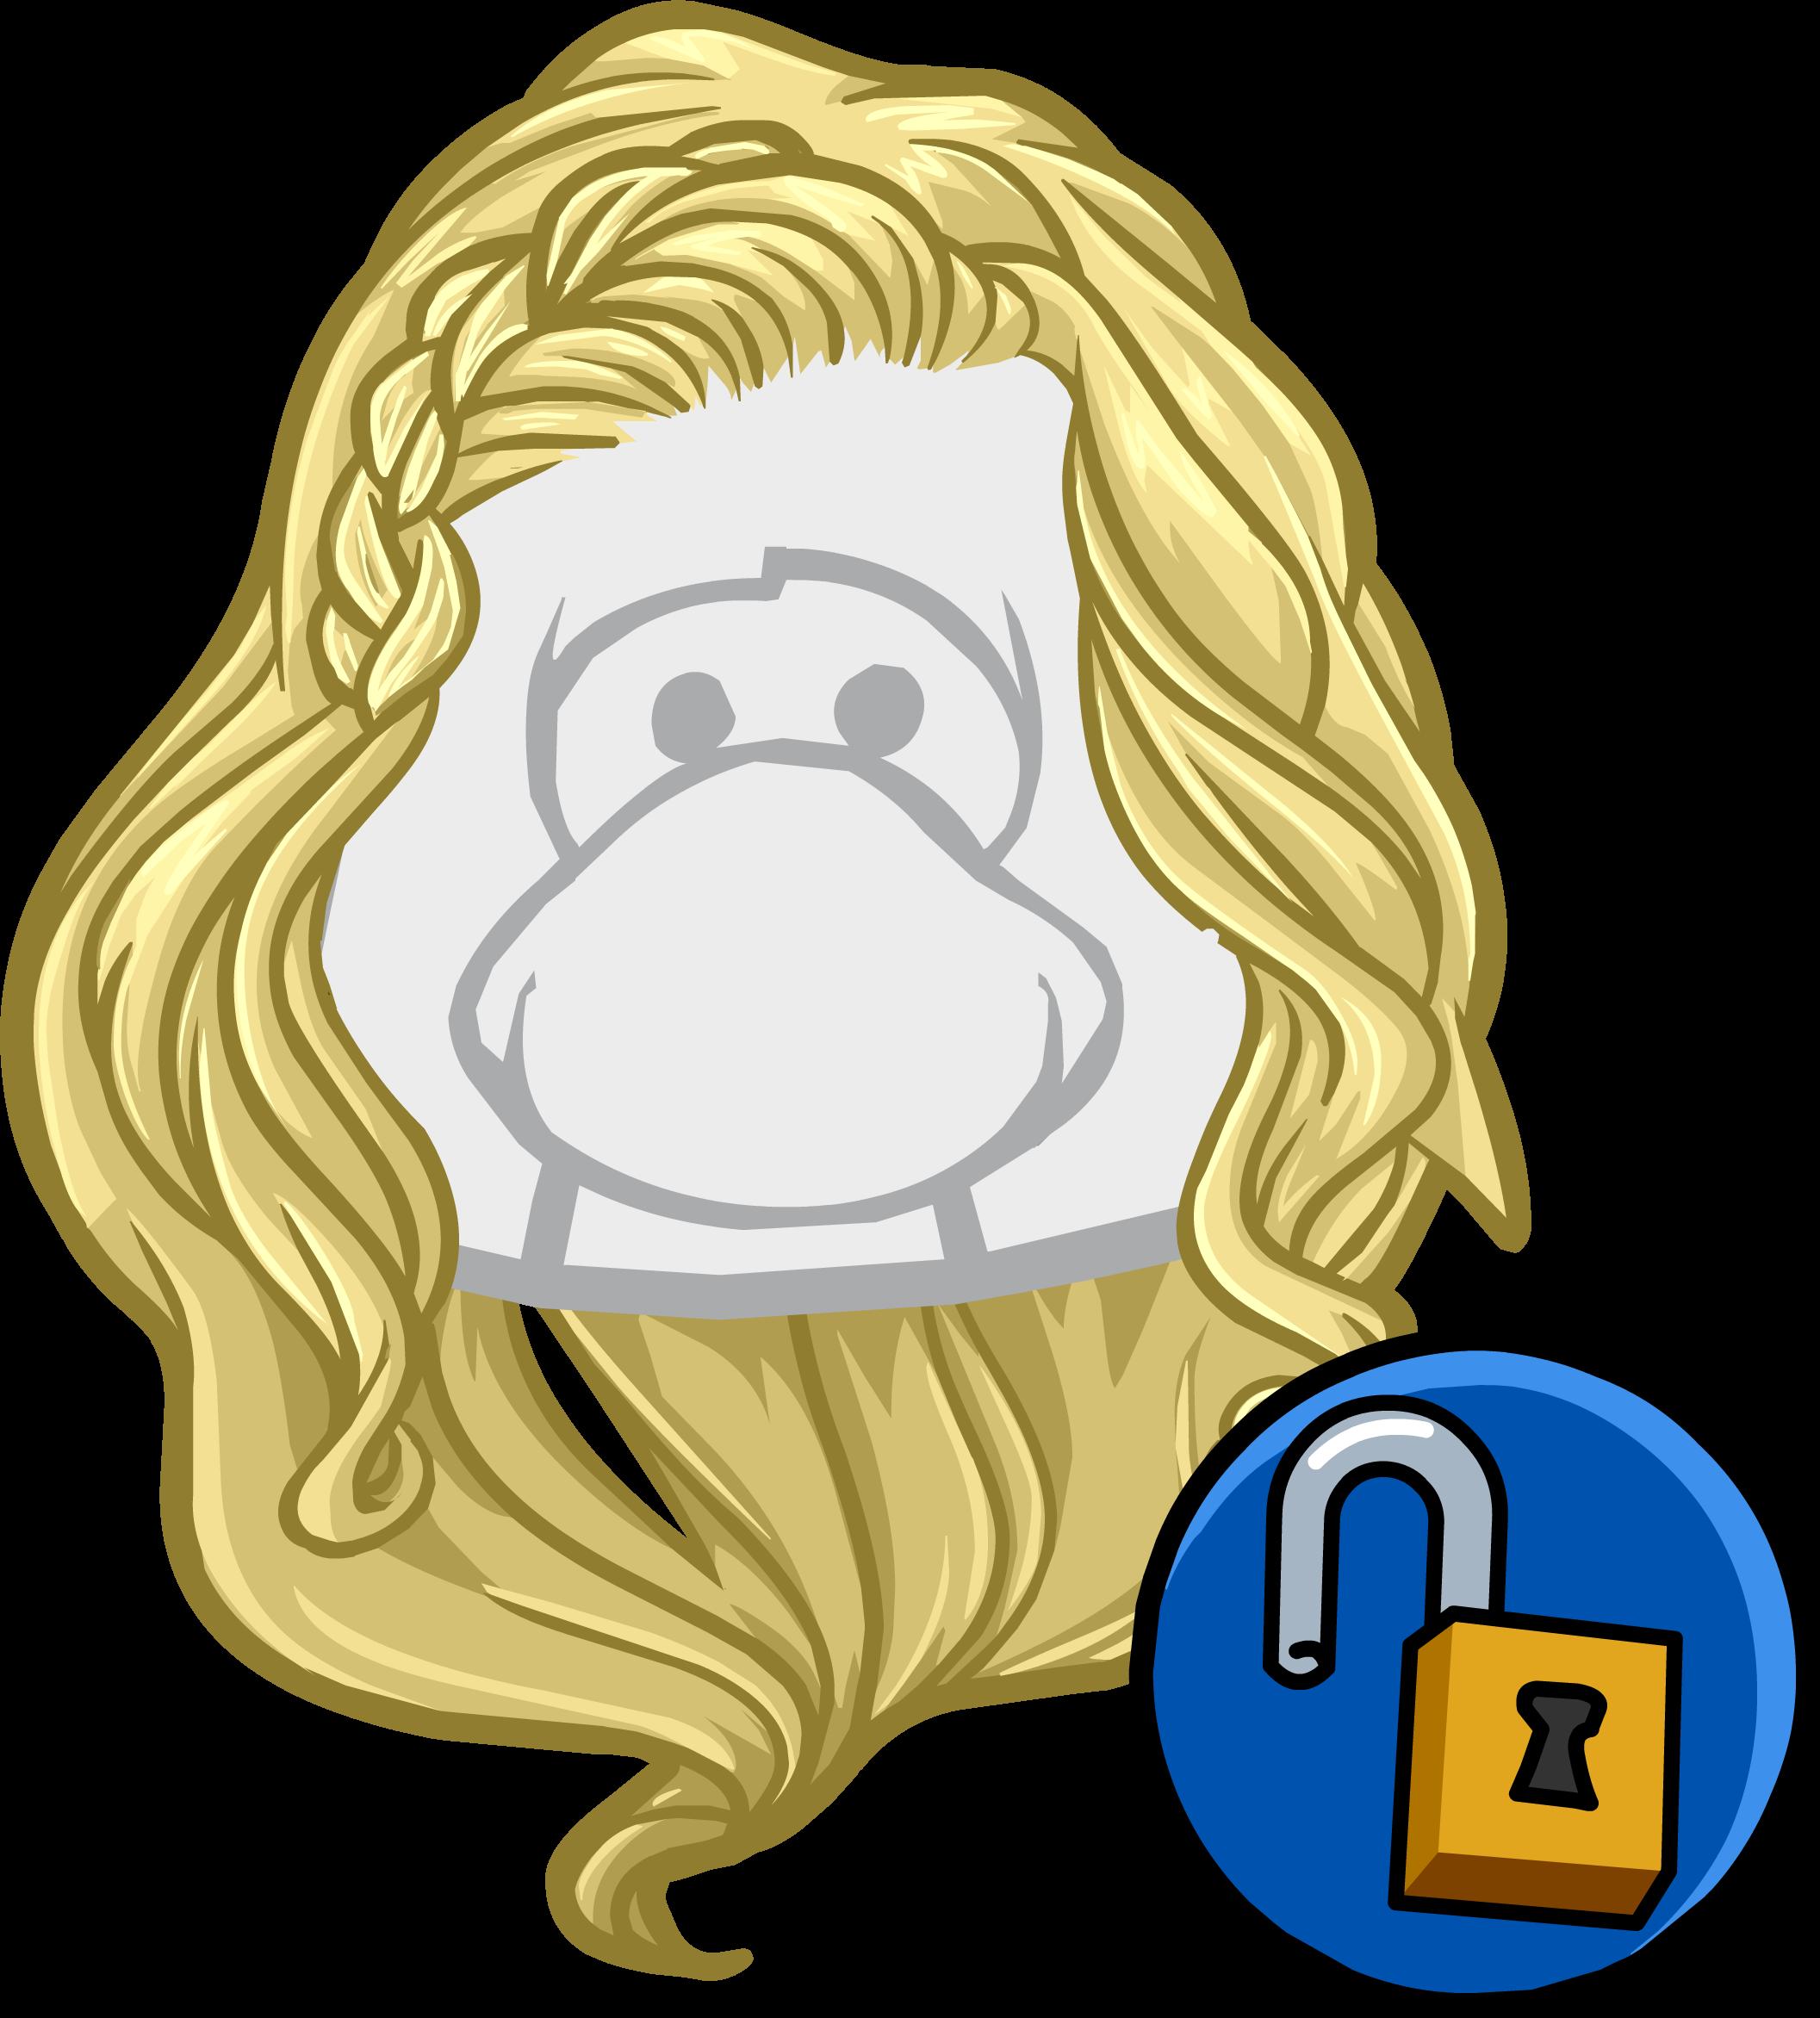 Codes For Blonde Hair On Club Penguin | myideasbedroom.com